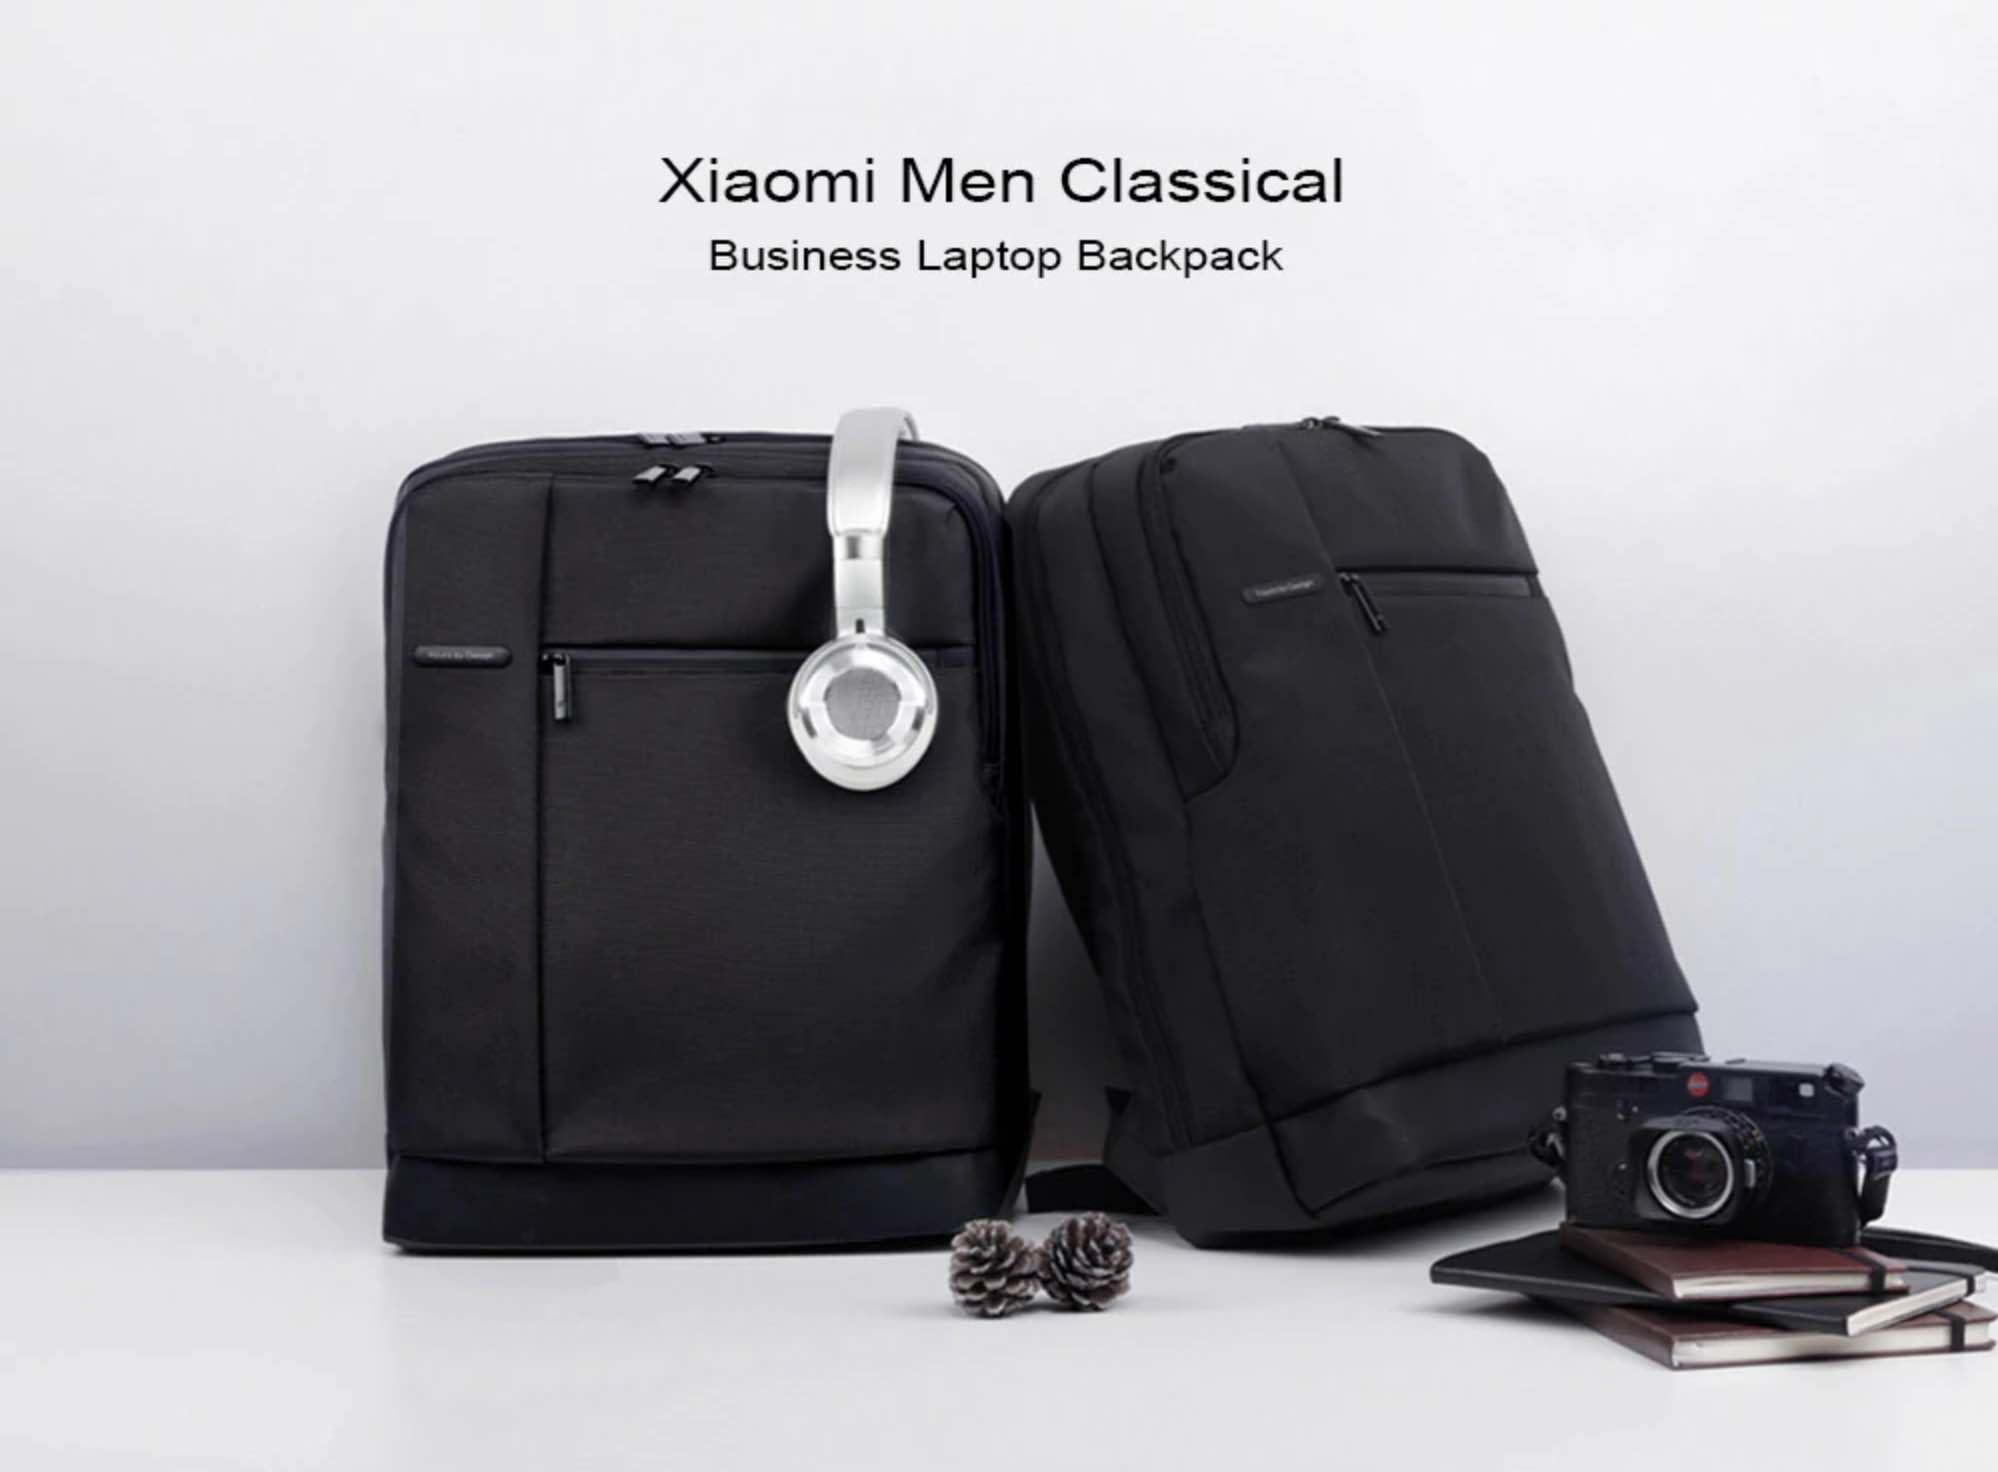 GearBest: Xiaomi Men Classical Business Laptop Backpack